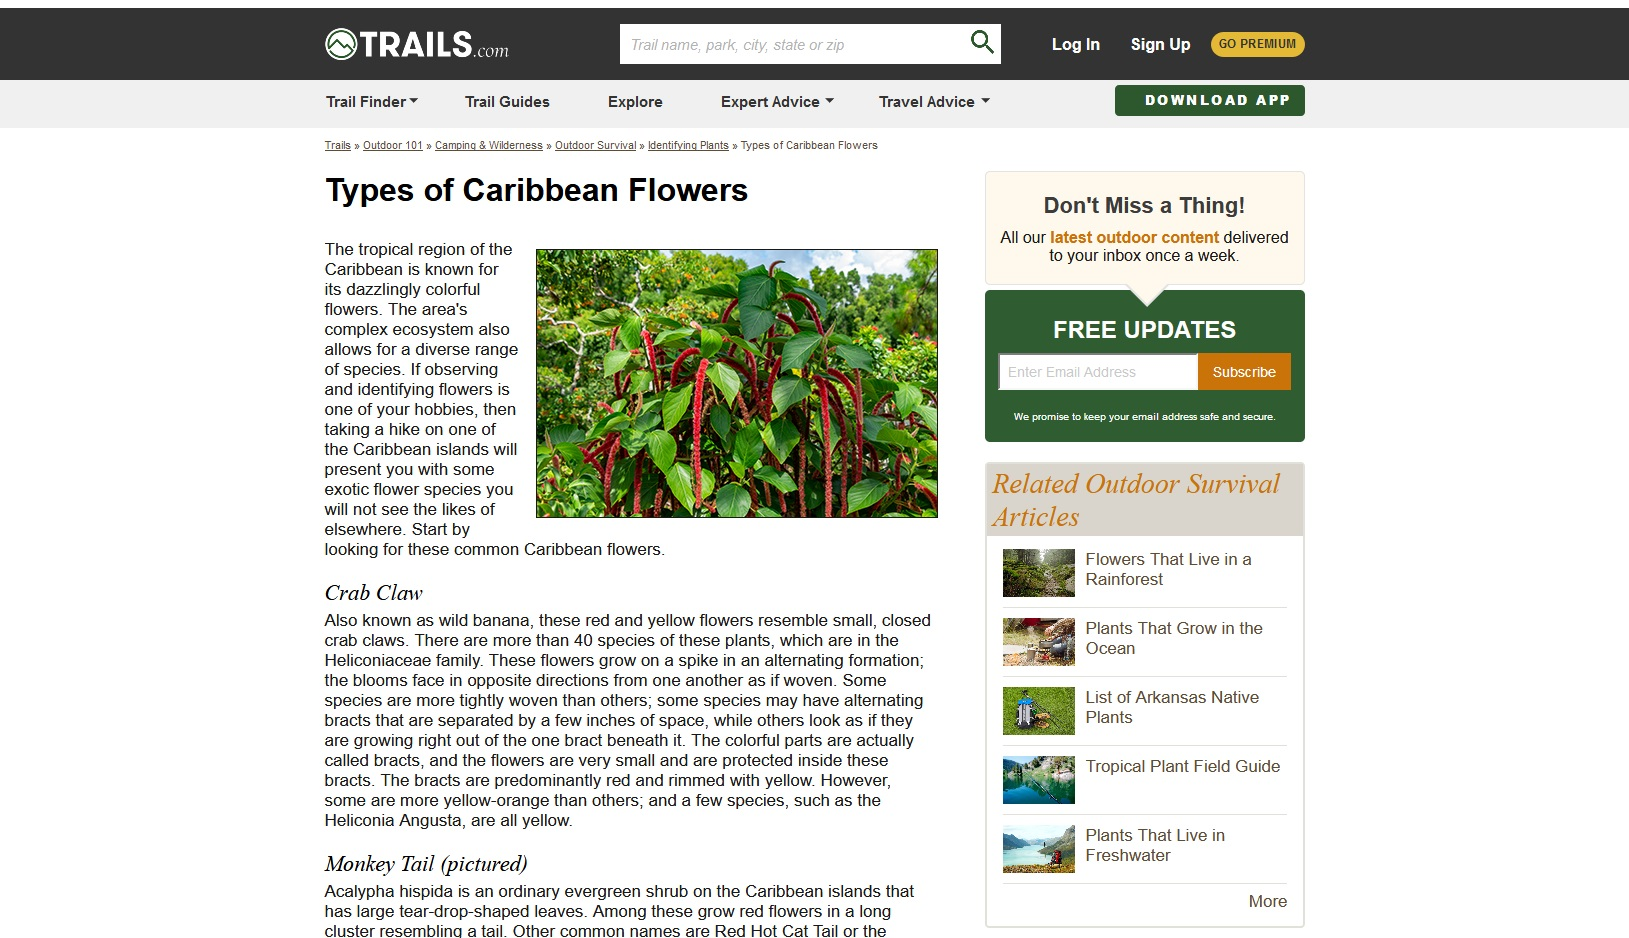 Monkey Tail plant (Trails.com)